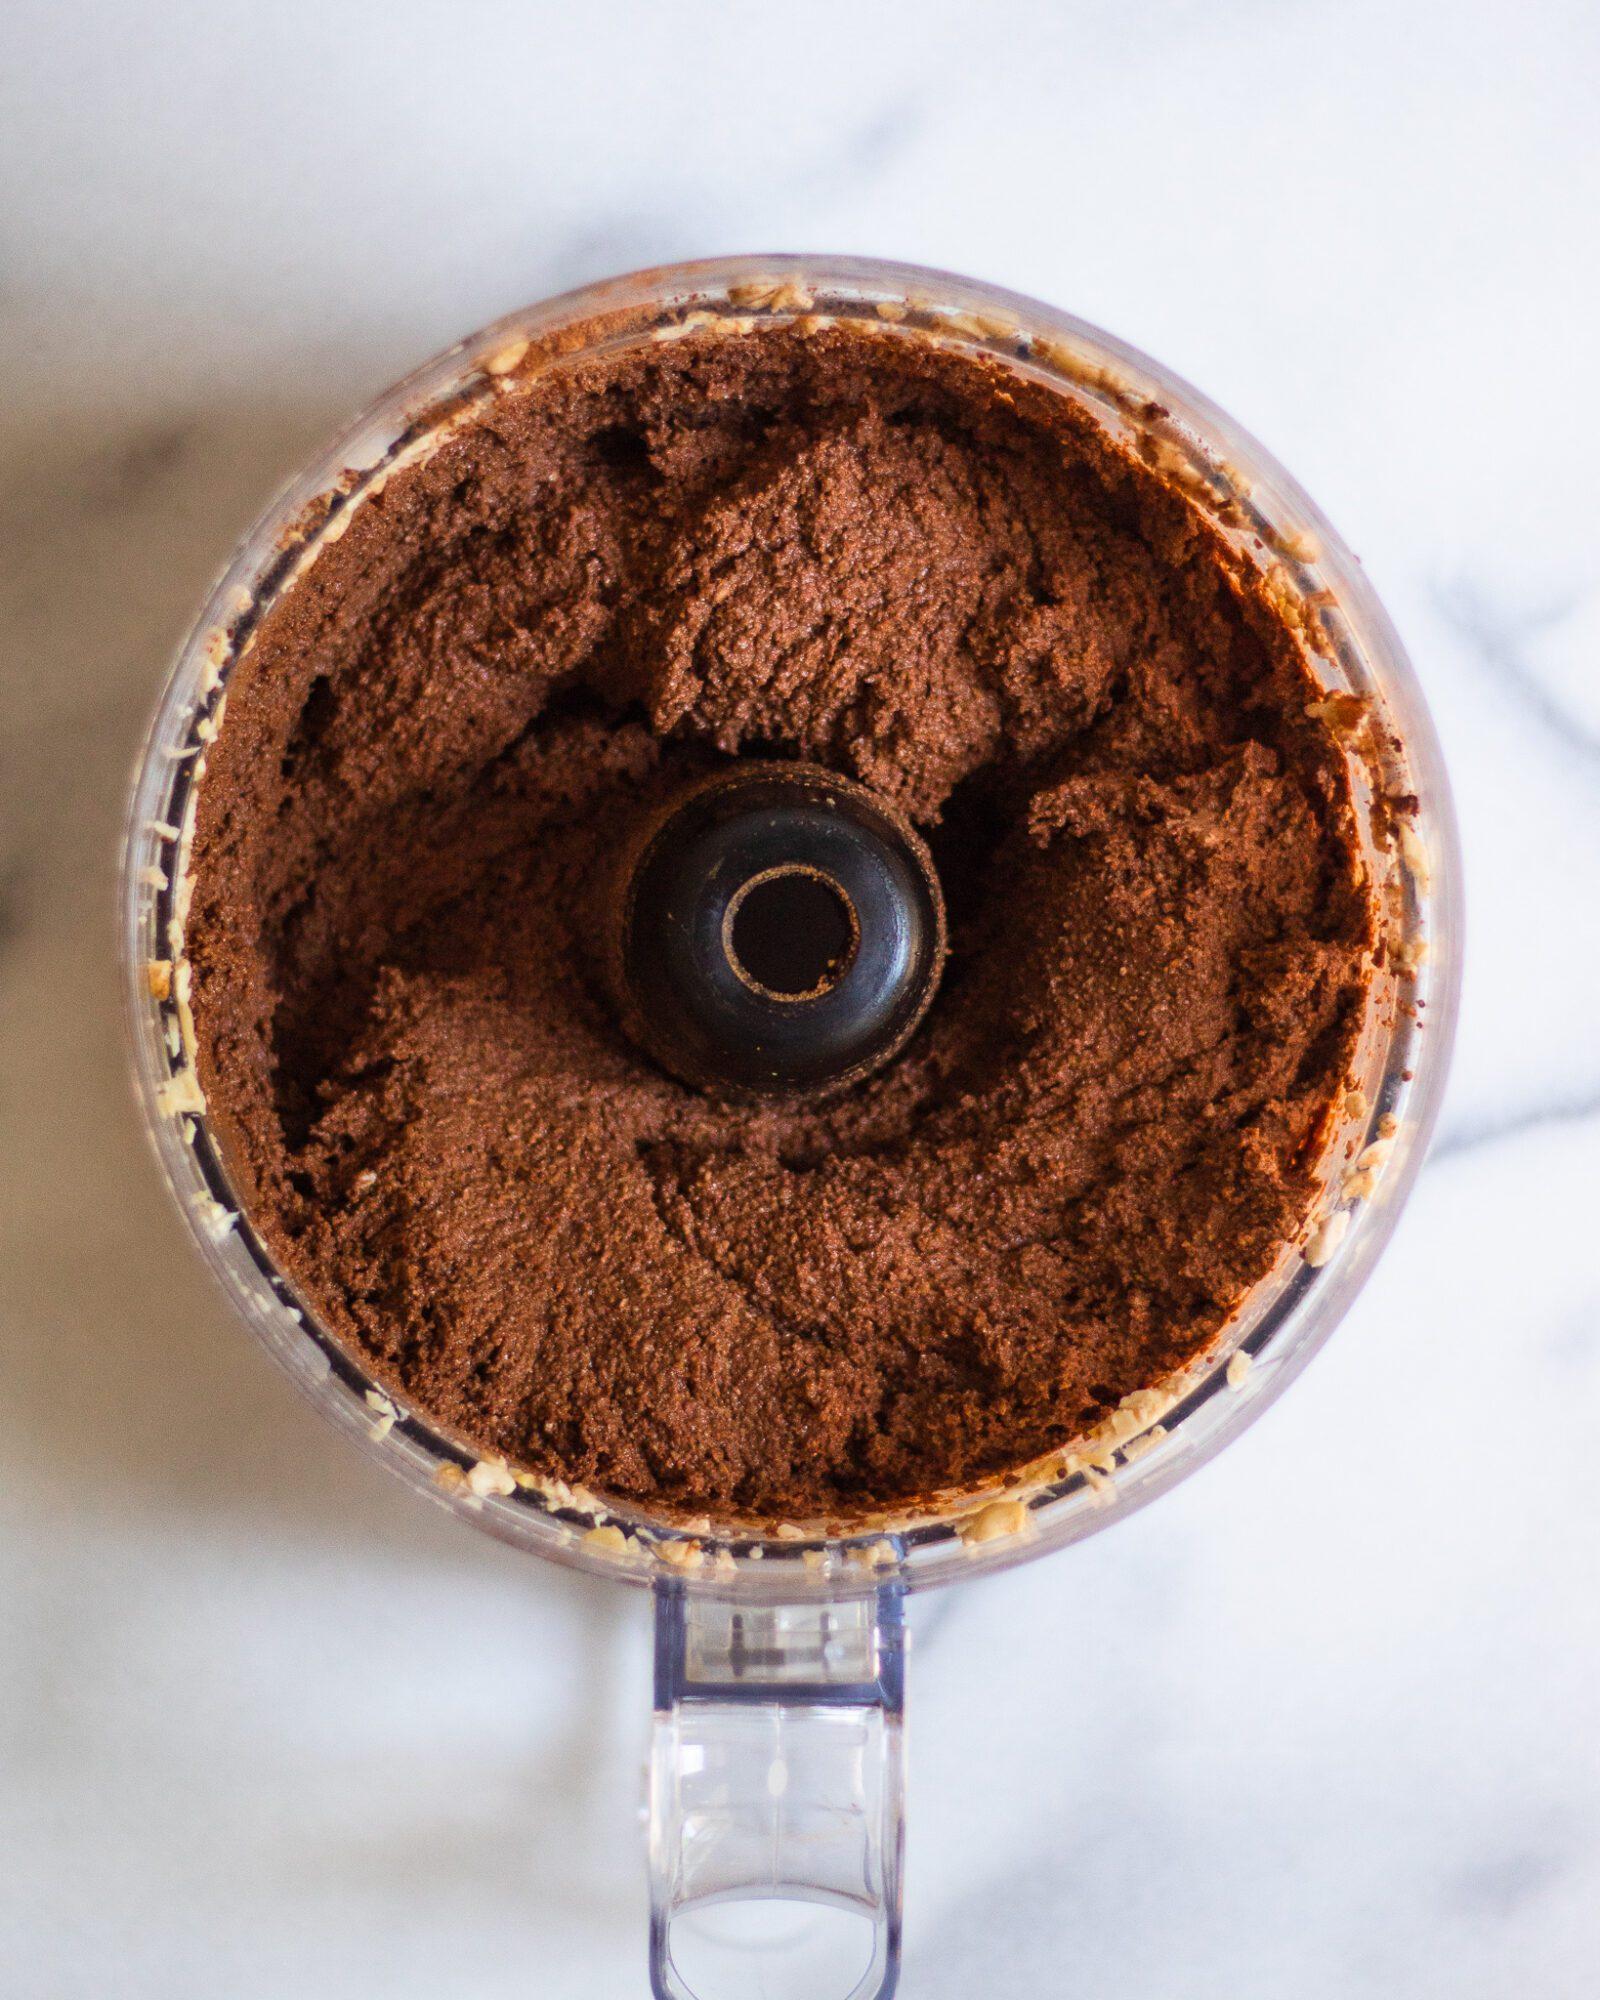 vegan chocolate pie filling after blending